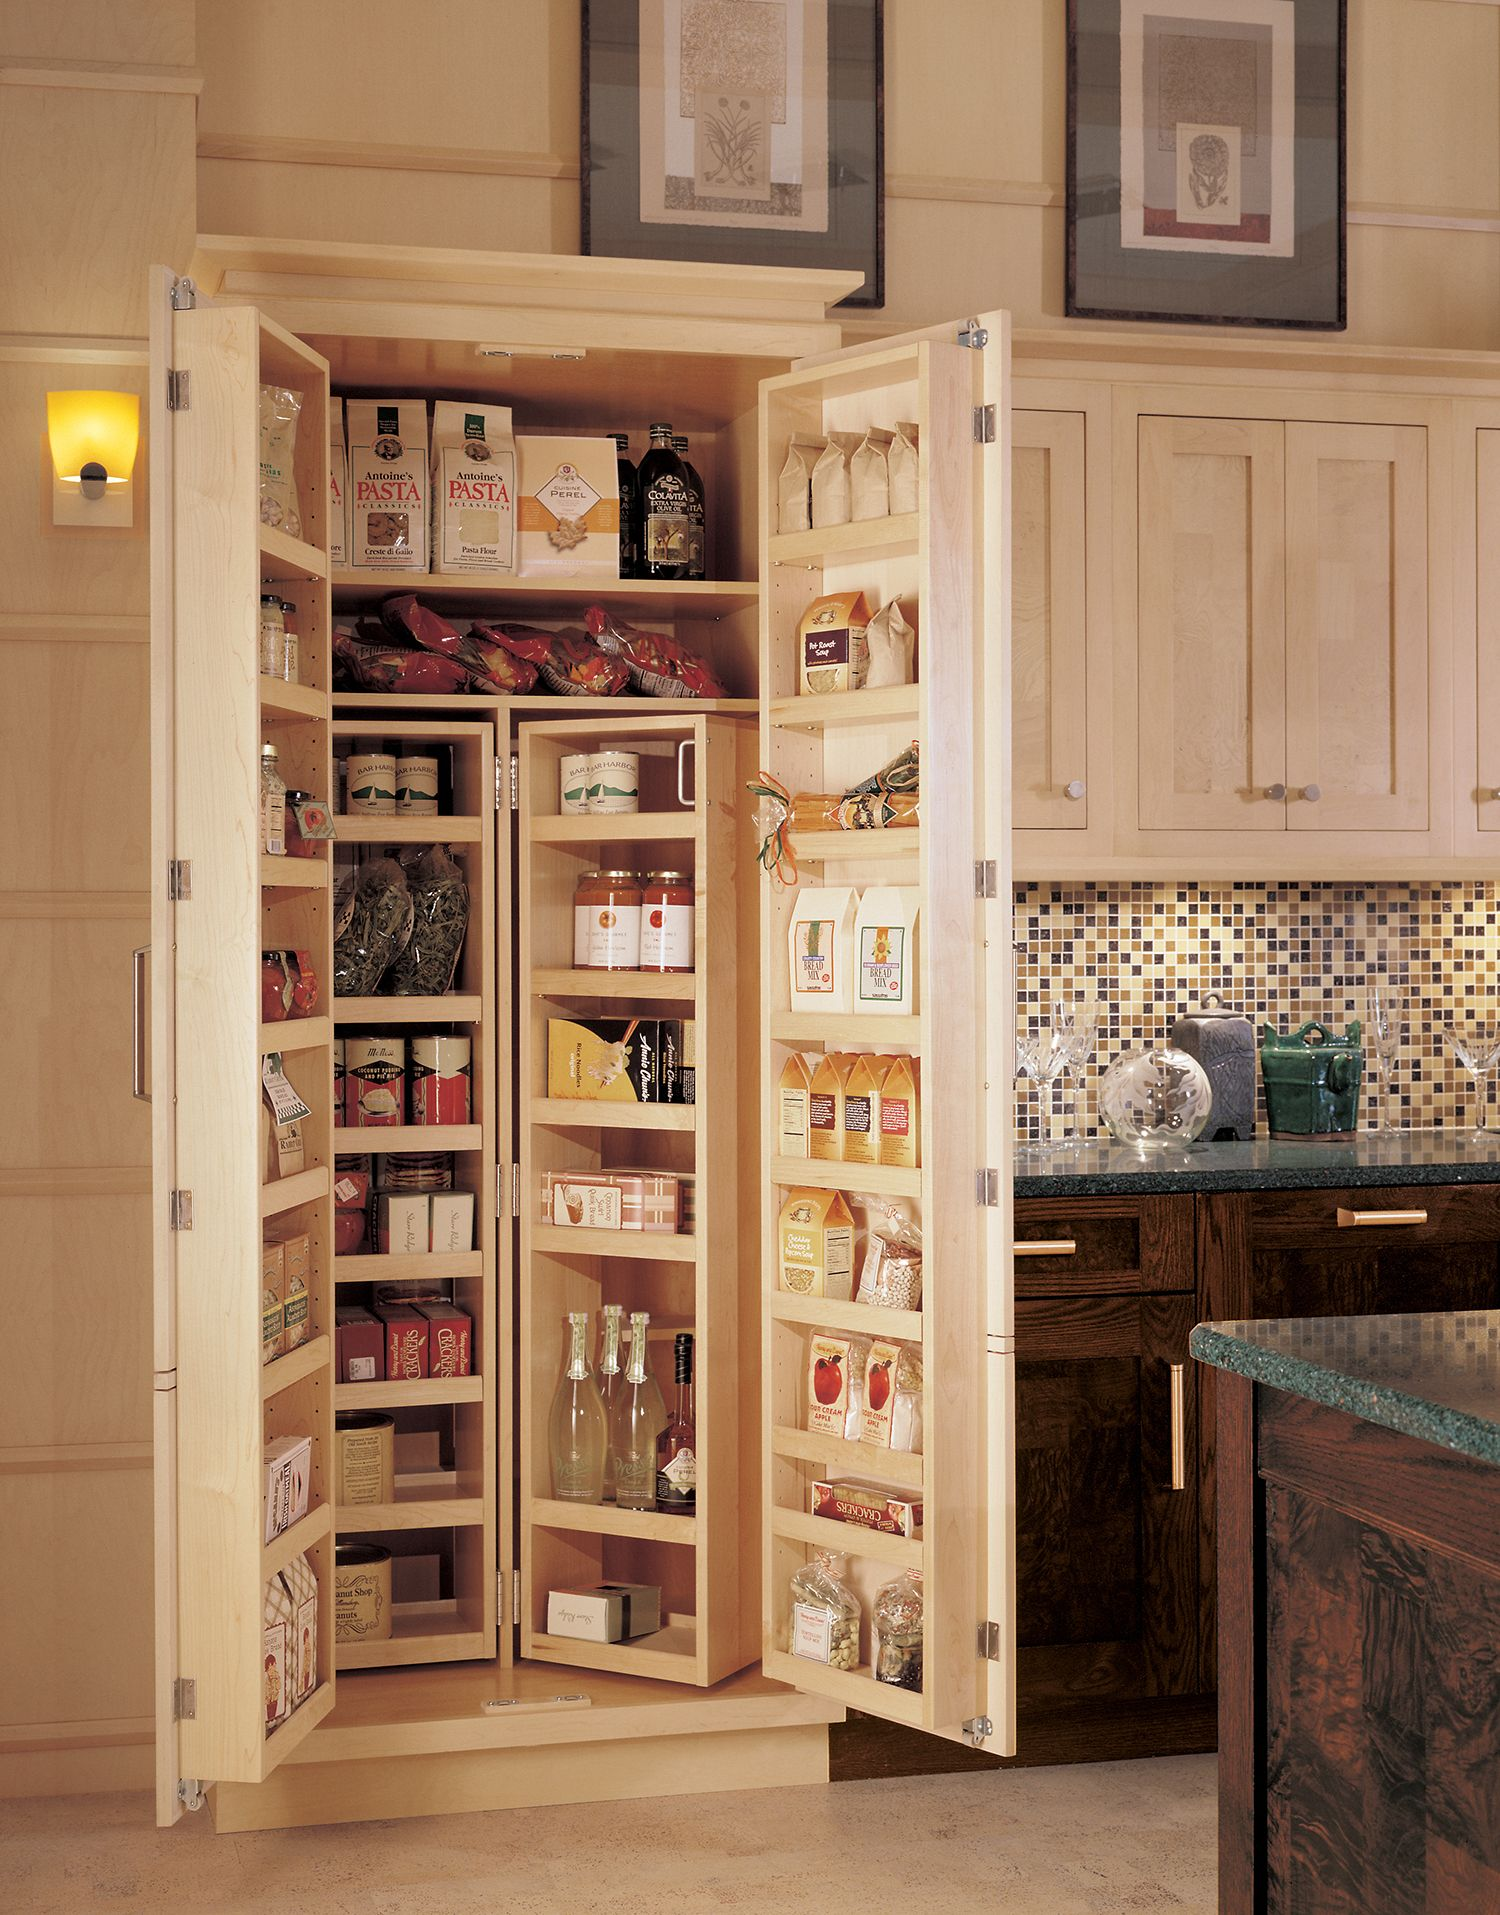 Chef S Pantry Kitchen Furniture Storage Kitchen Remodel Small